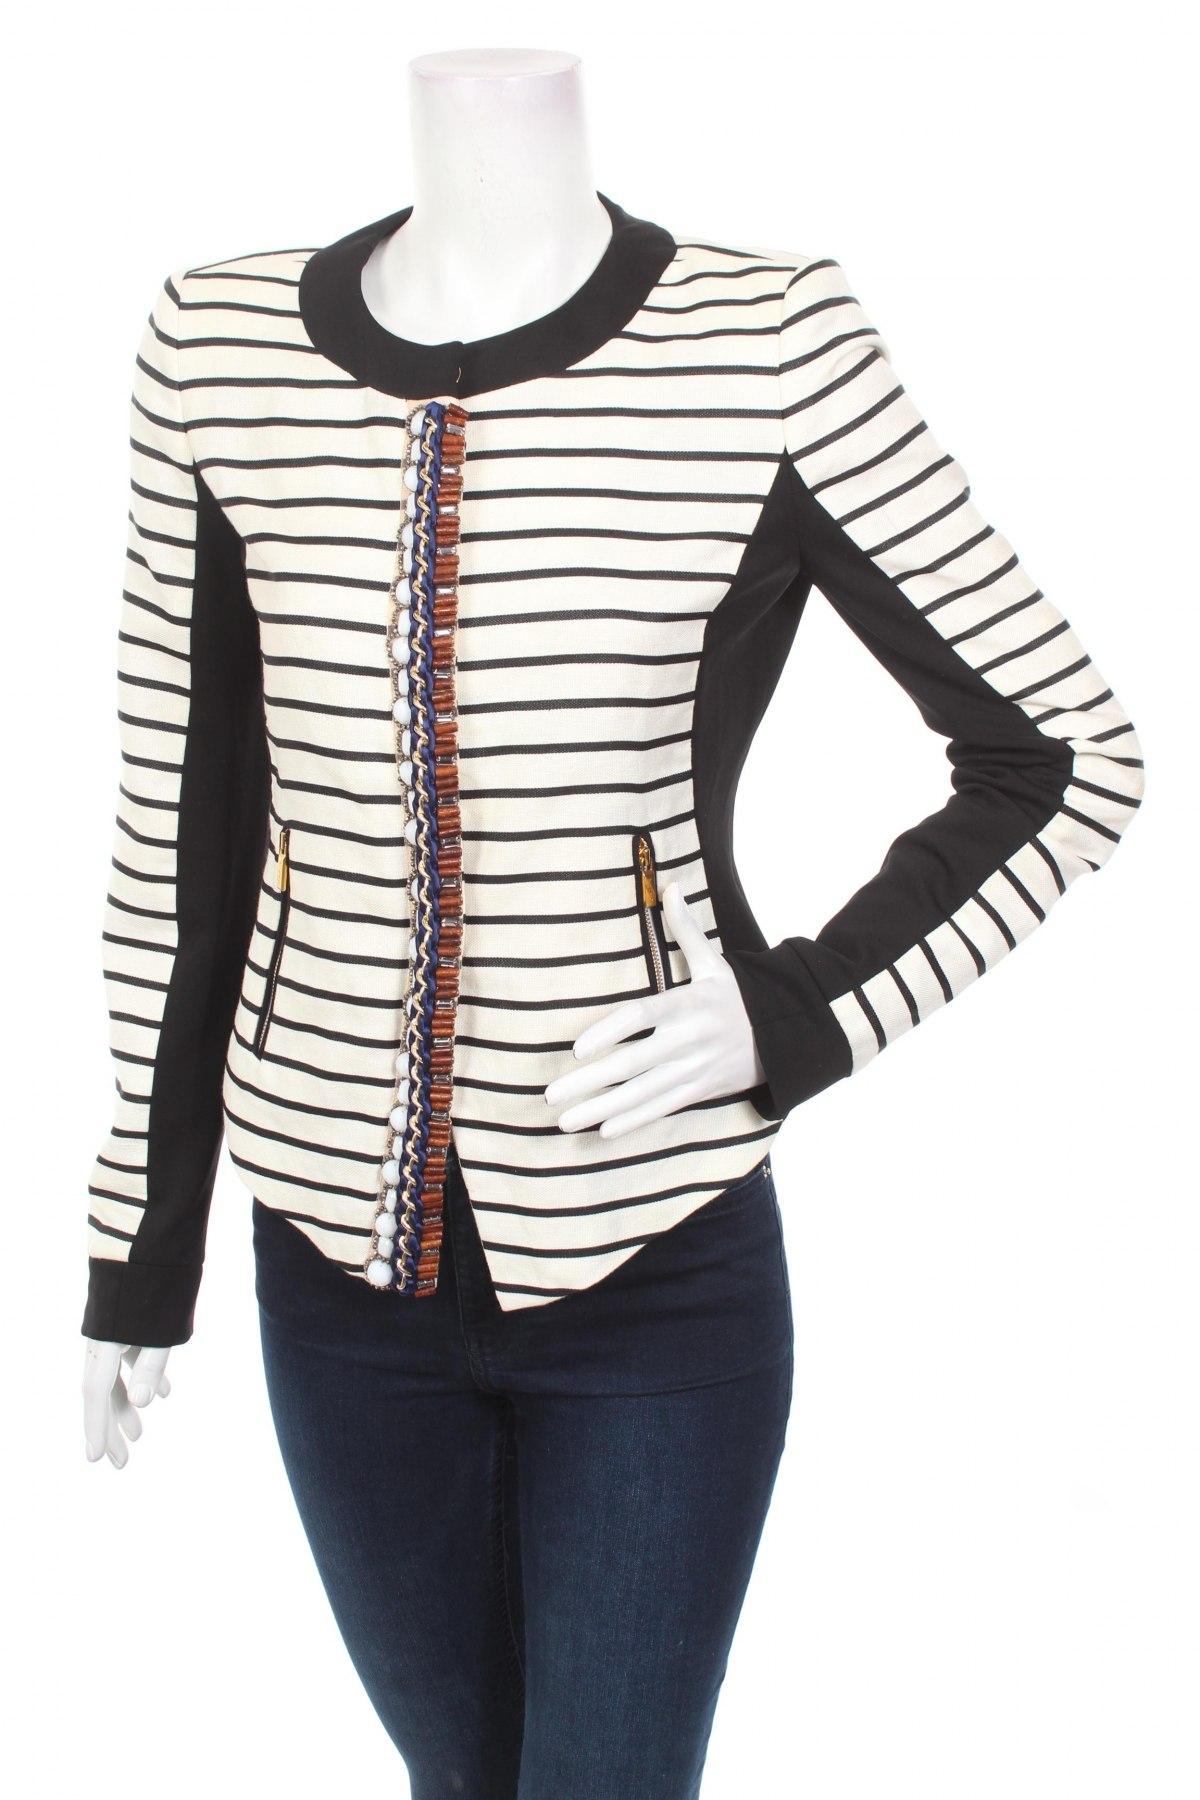 ab62f01c032f Γυναικείο σακάκι Pinko - αγοράστε σε τιμή που συμφέρει στο Remix ...